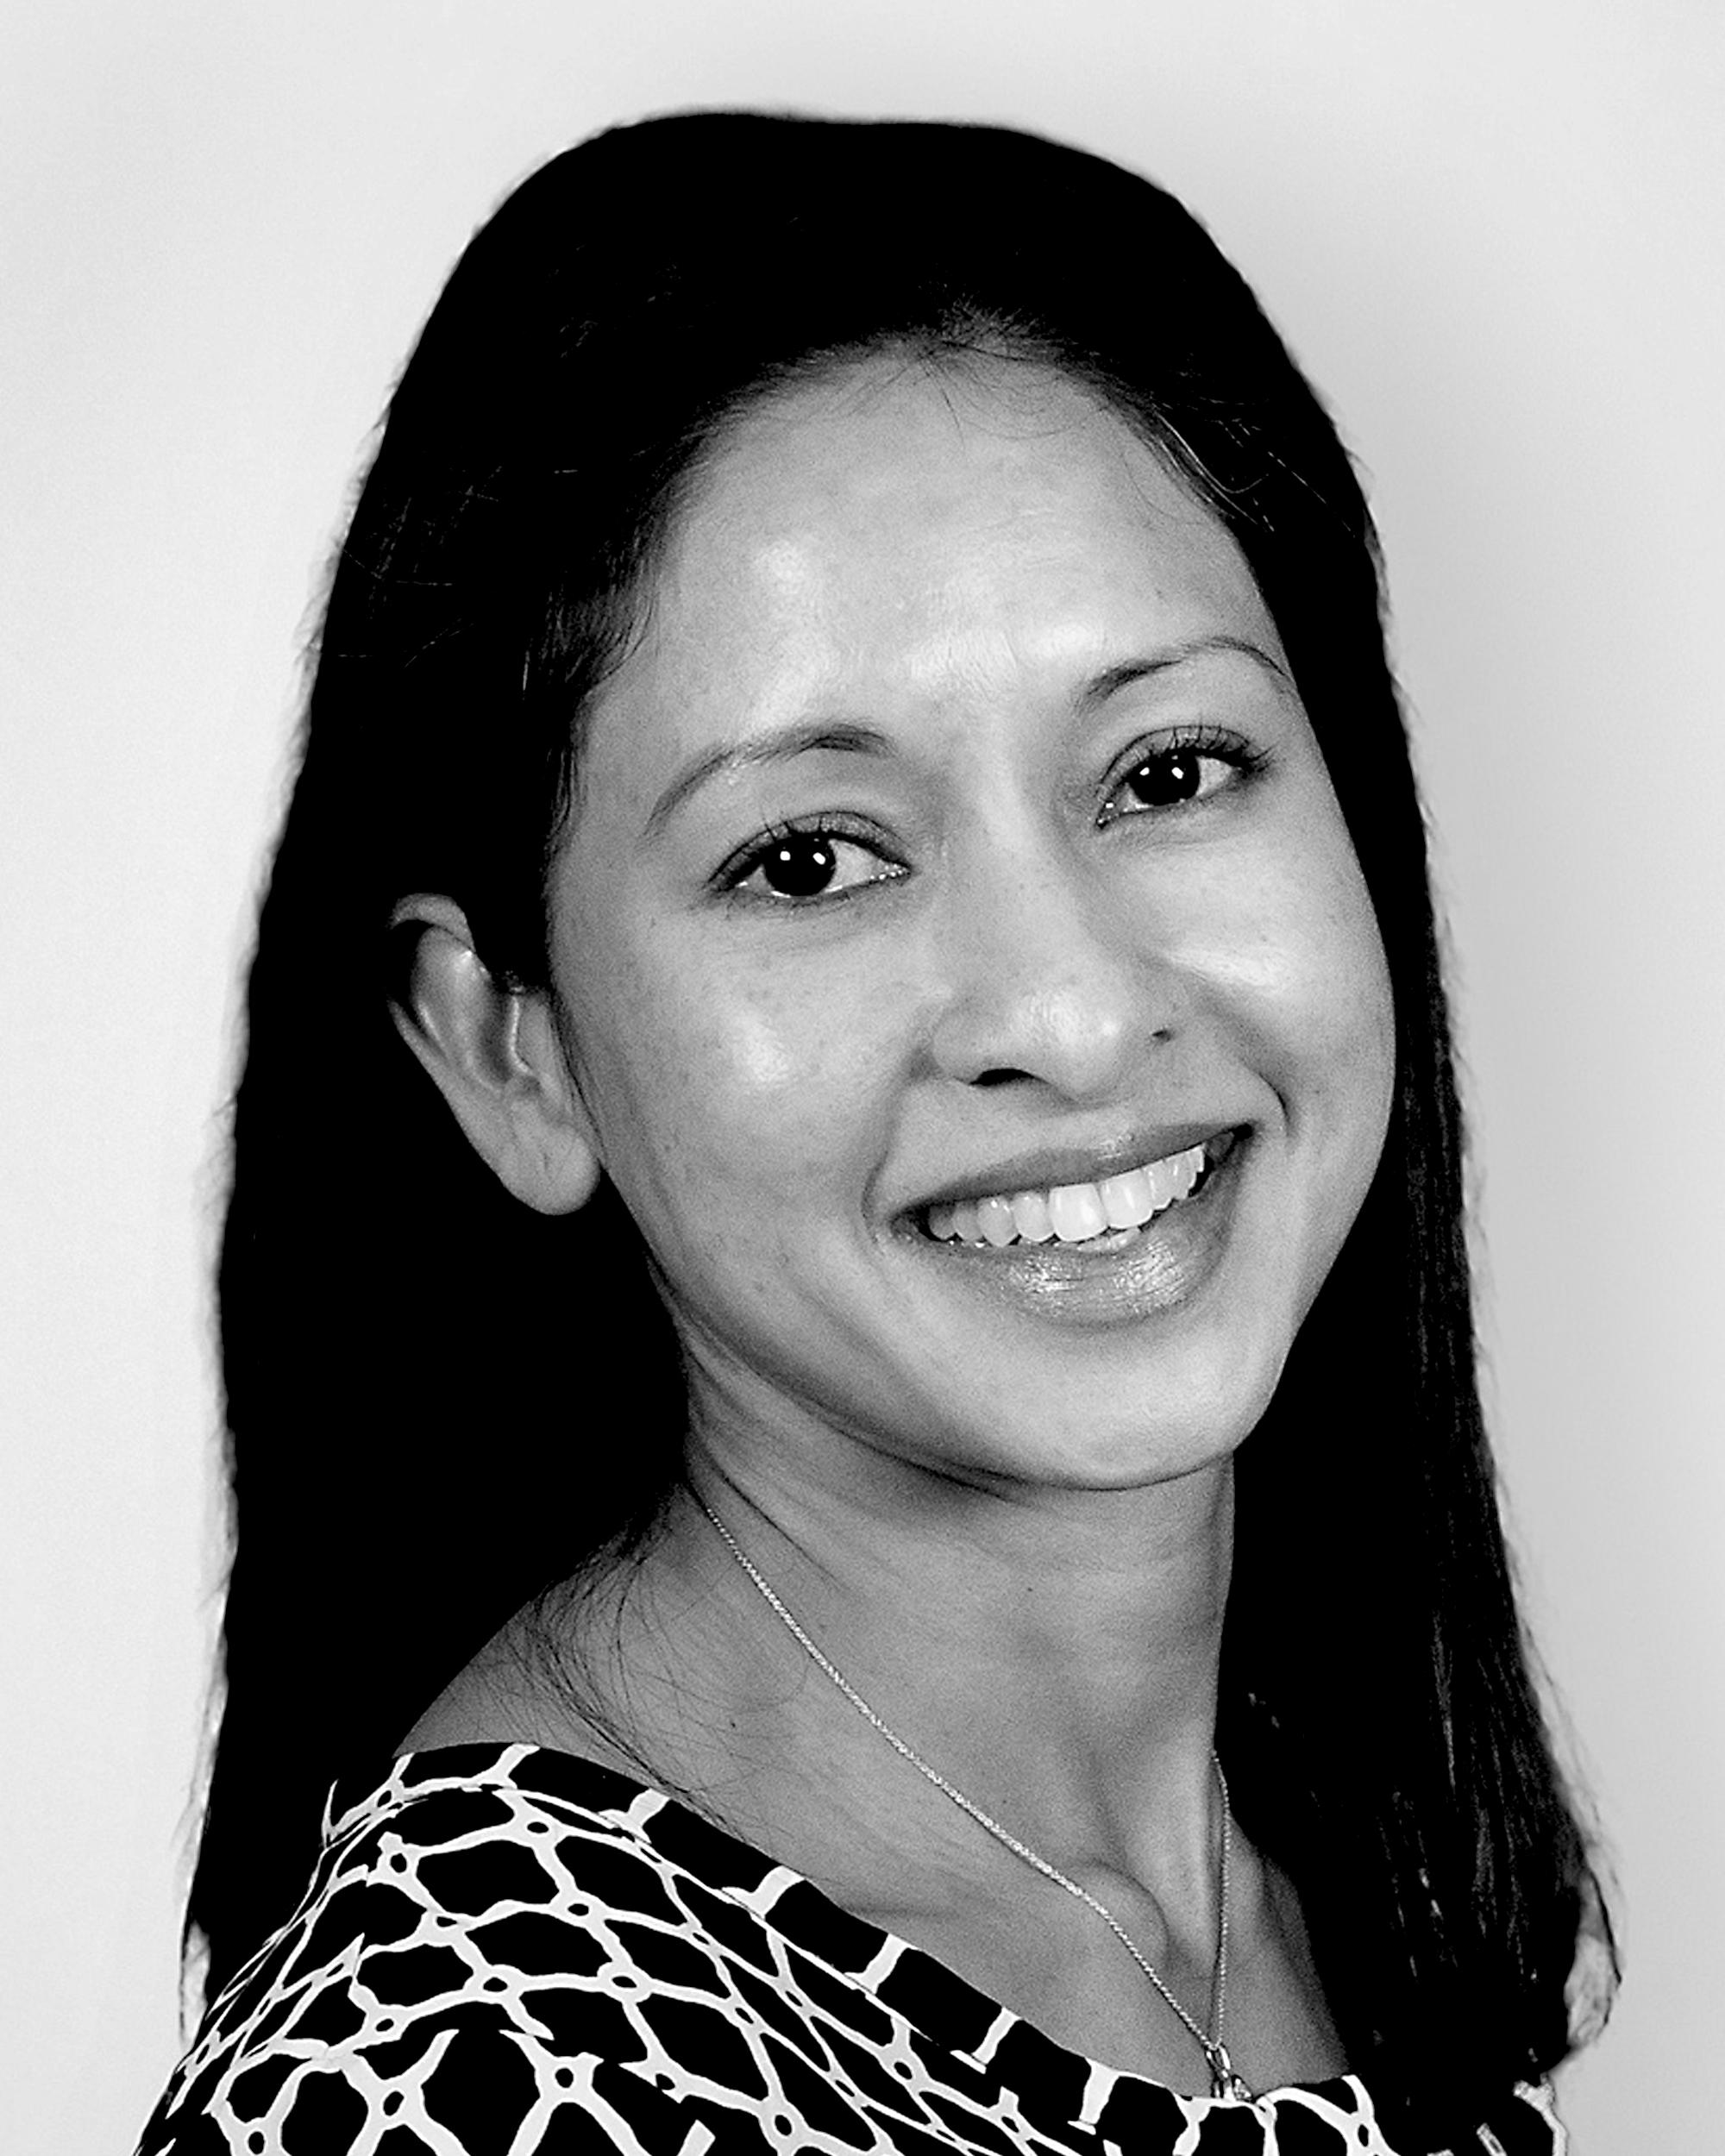 Headshot of Neena Soans